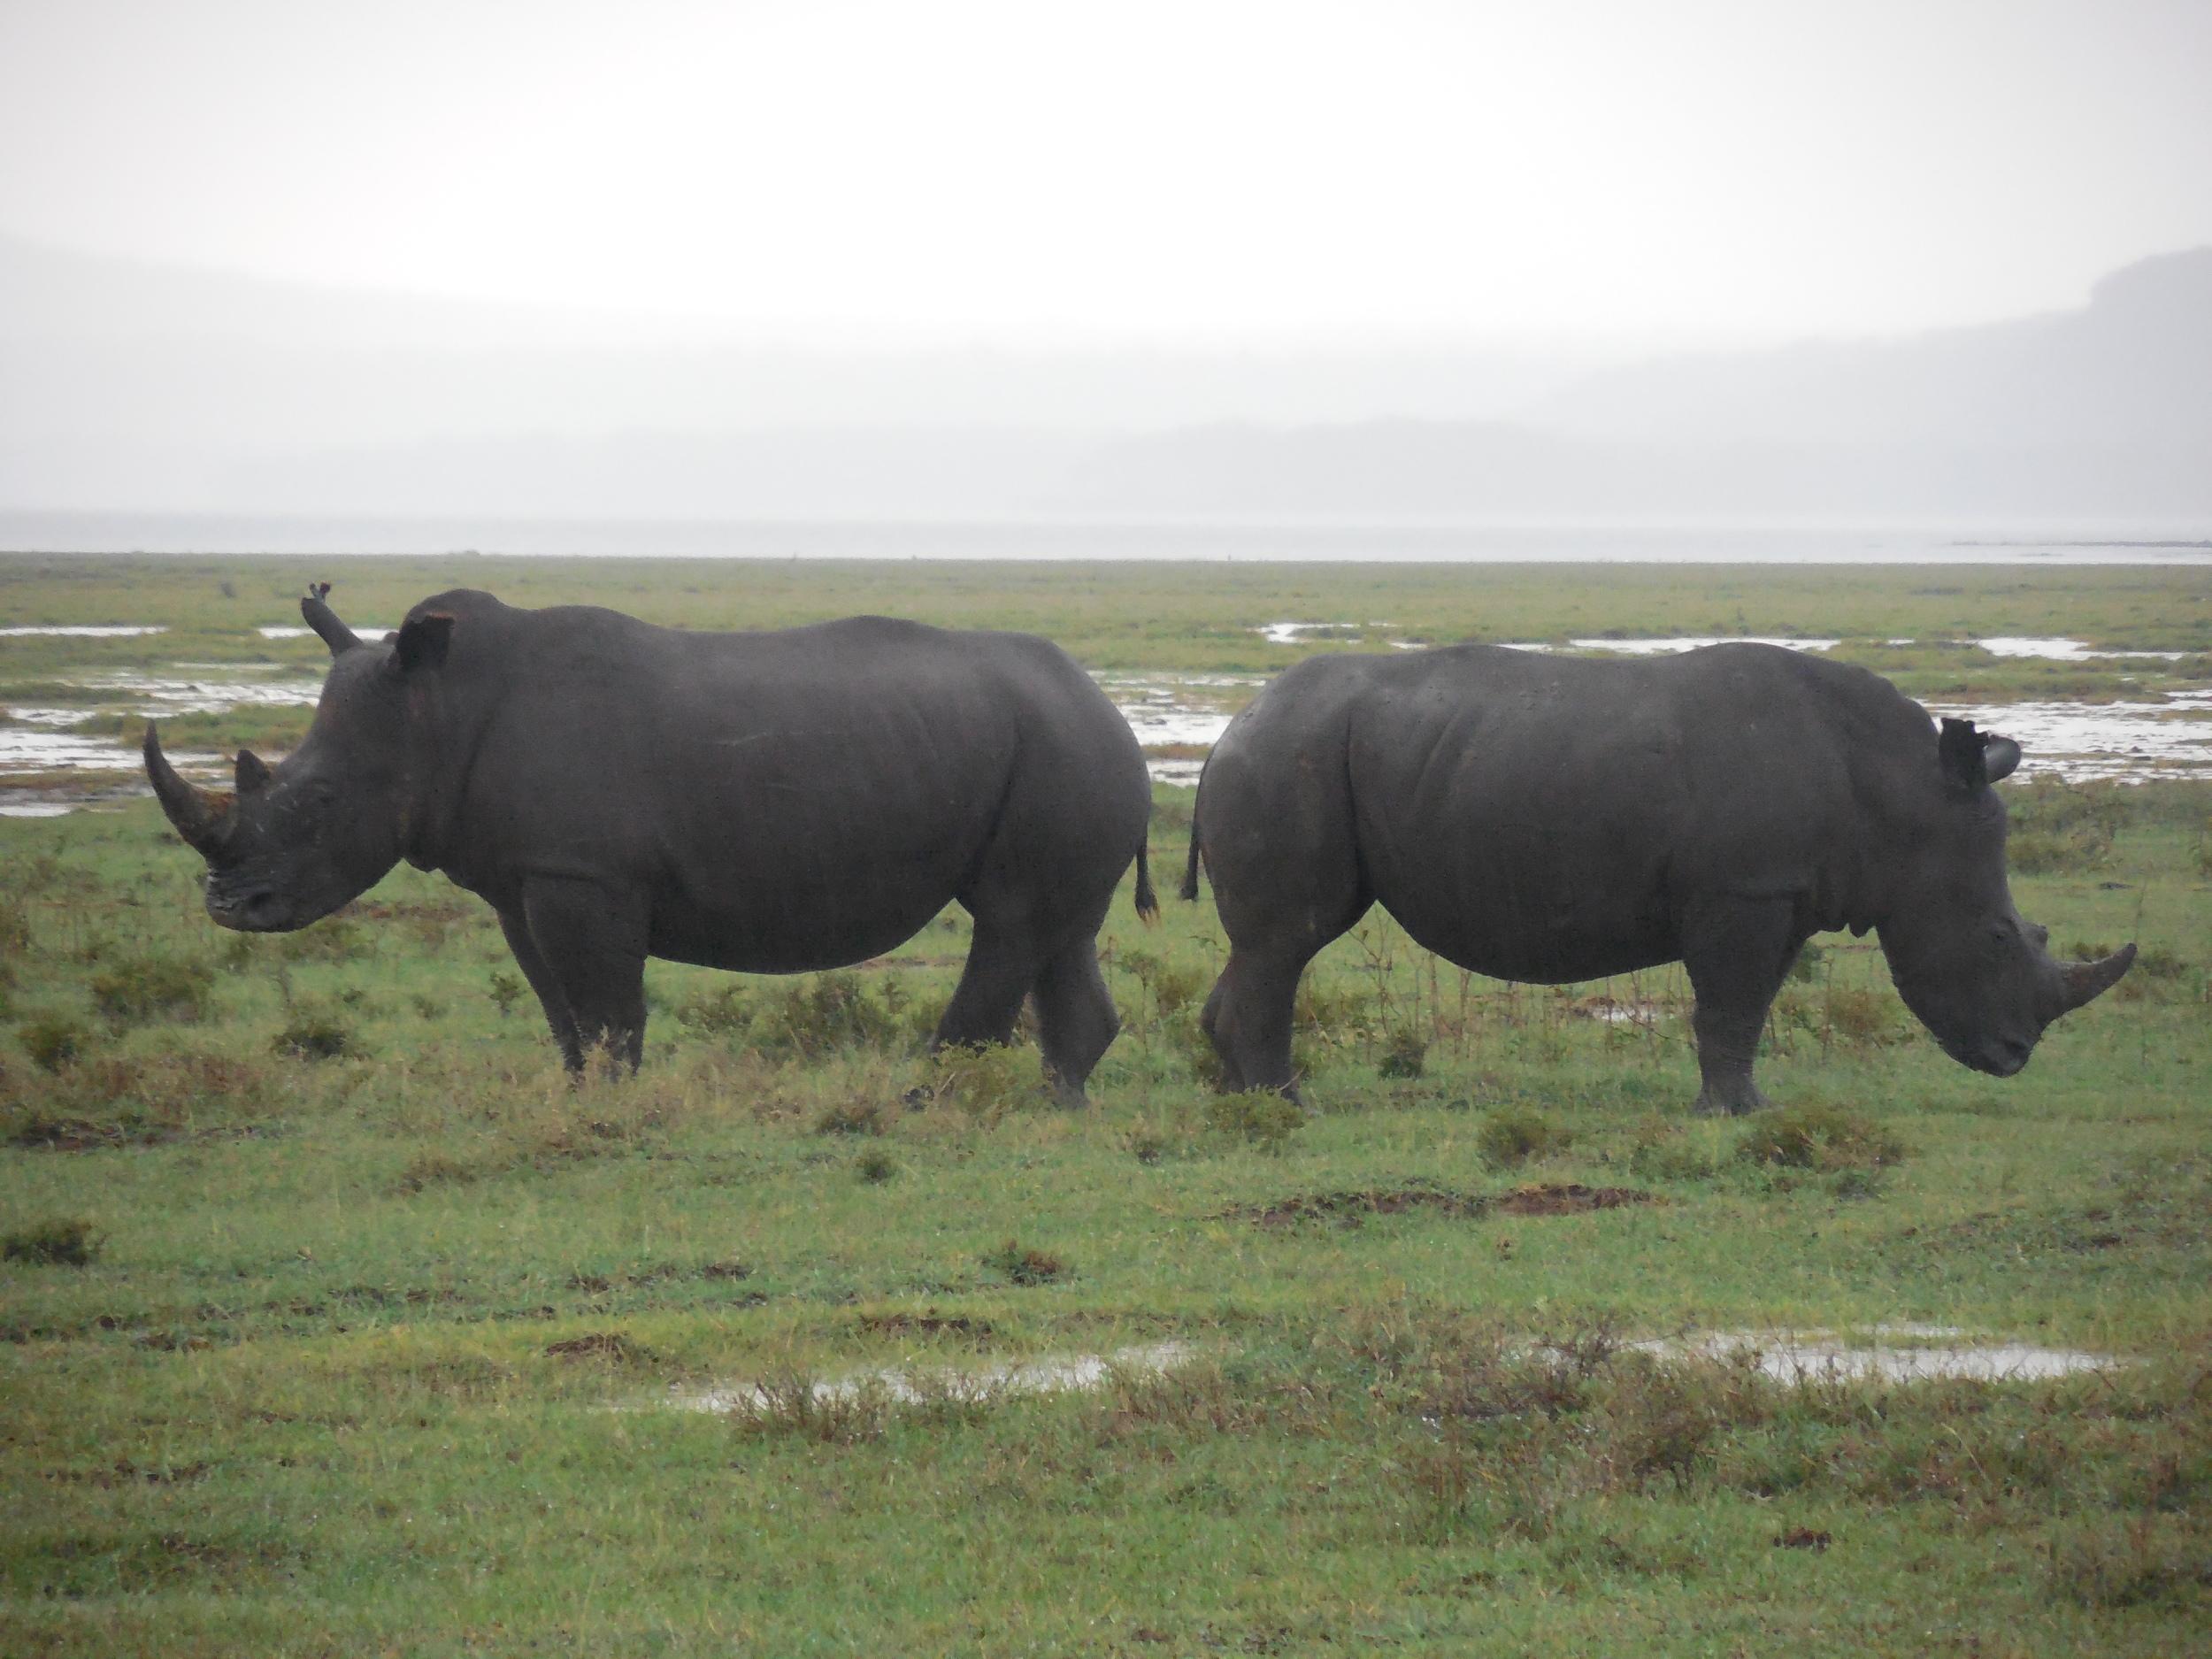 Lake Naivasha Kenya May 2014 © Flyga Twiga LLC